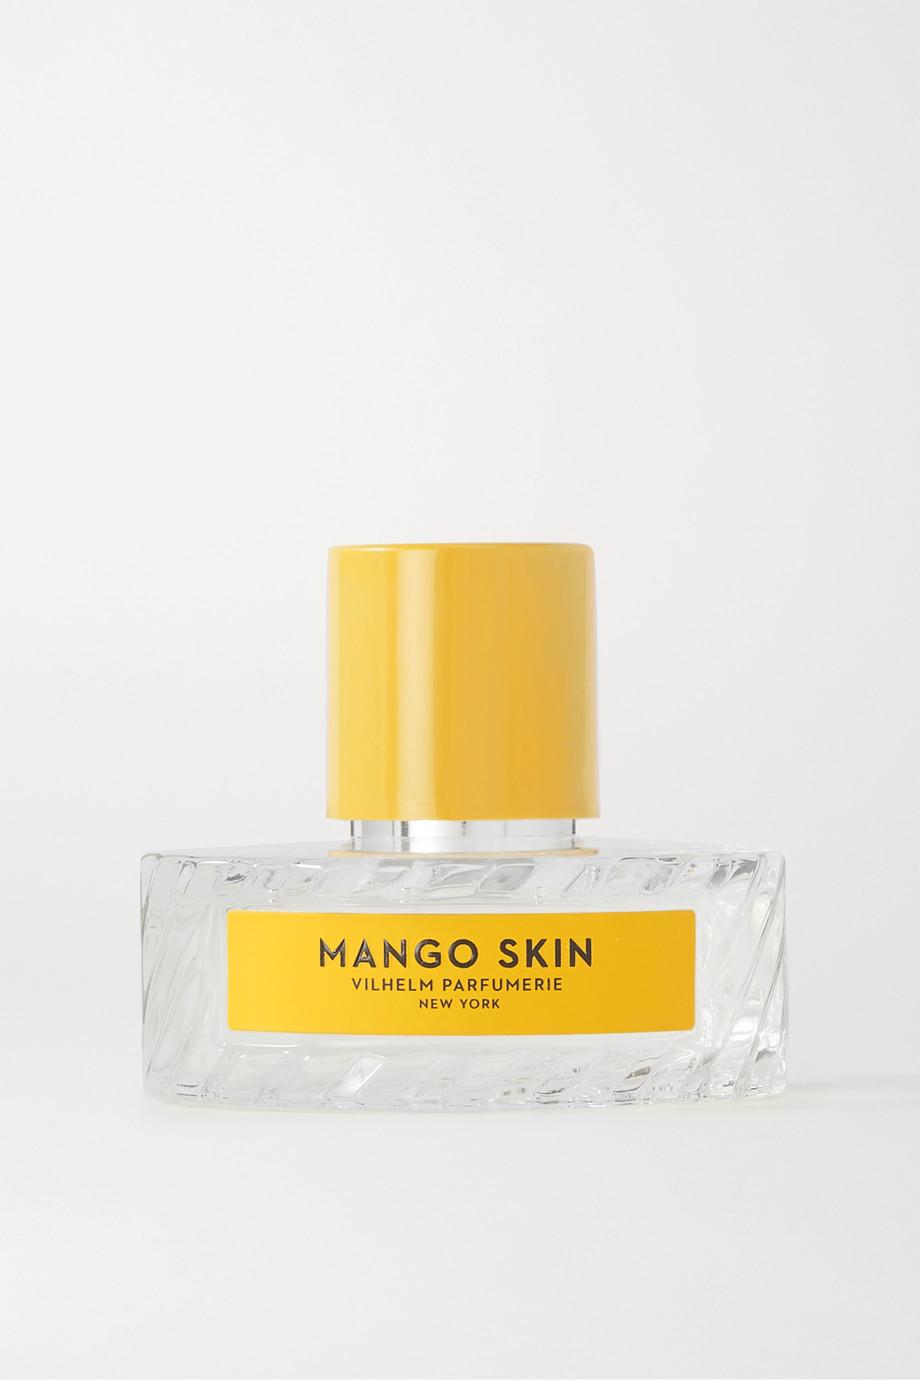 Vilhelm Parfumerie Mango Skin, 50 ml – Eau de Parfum